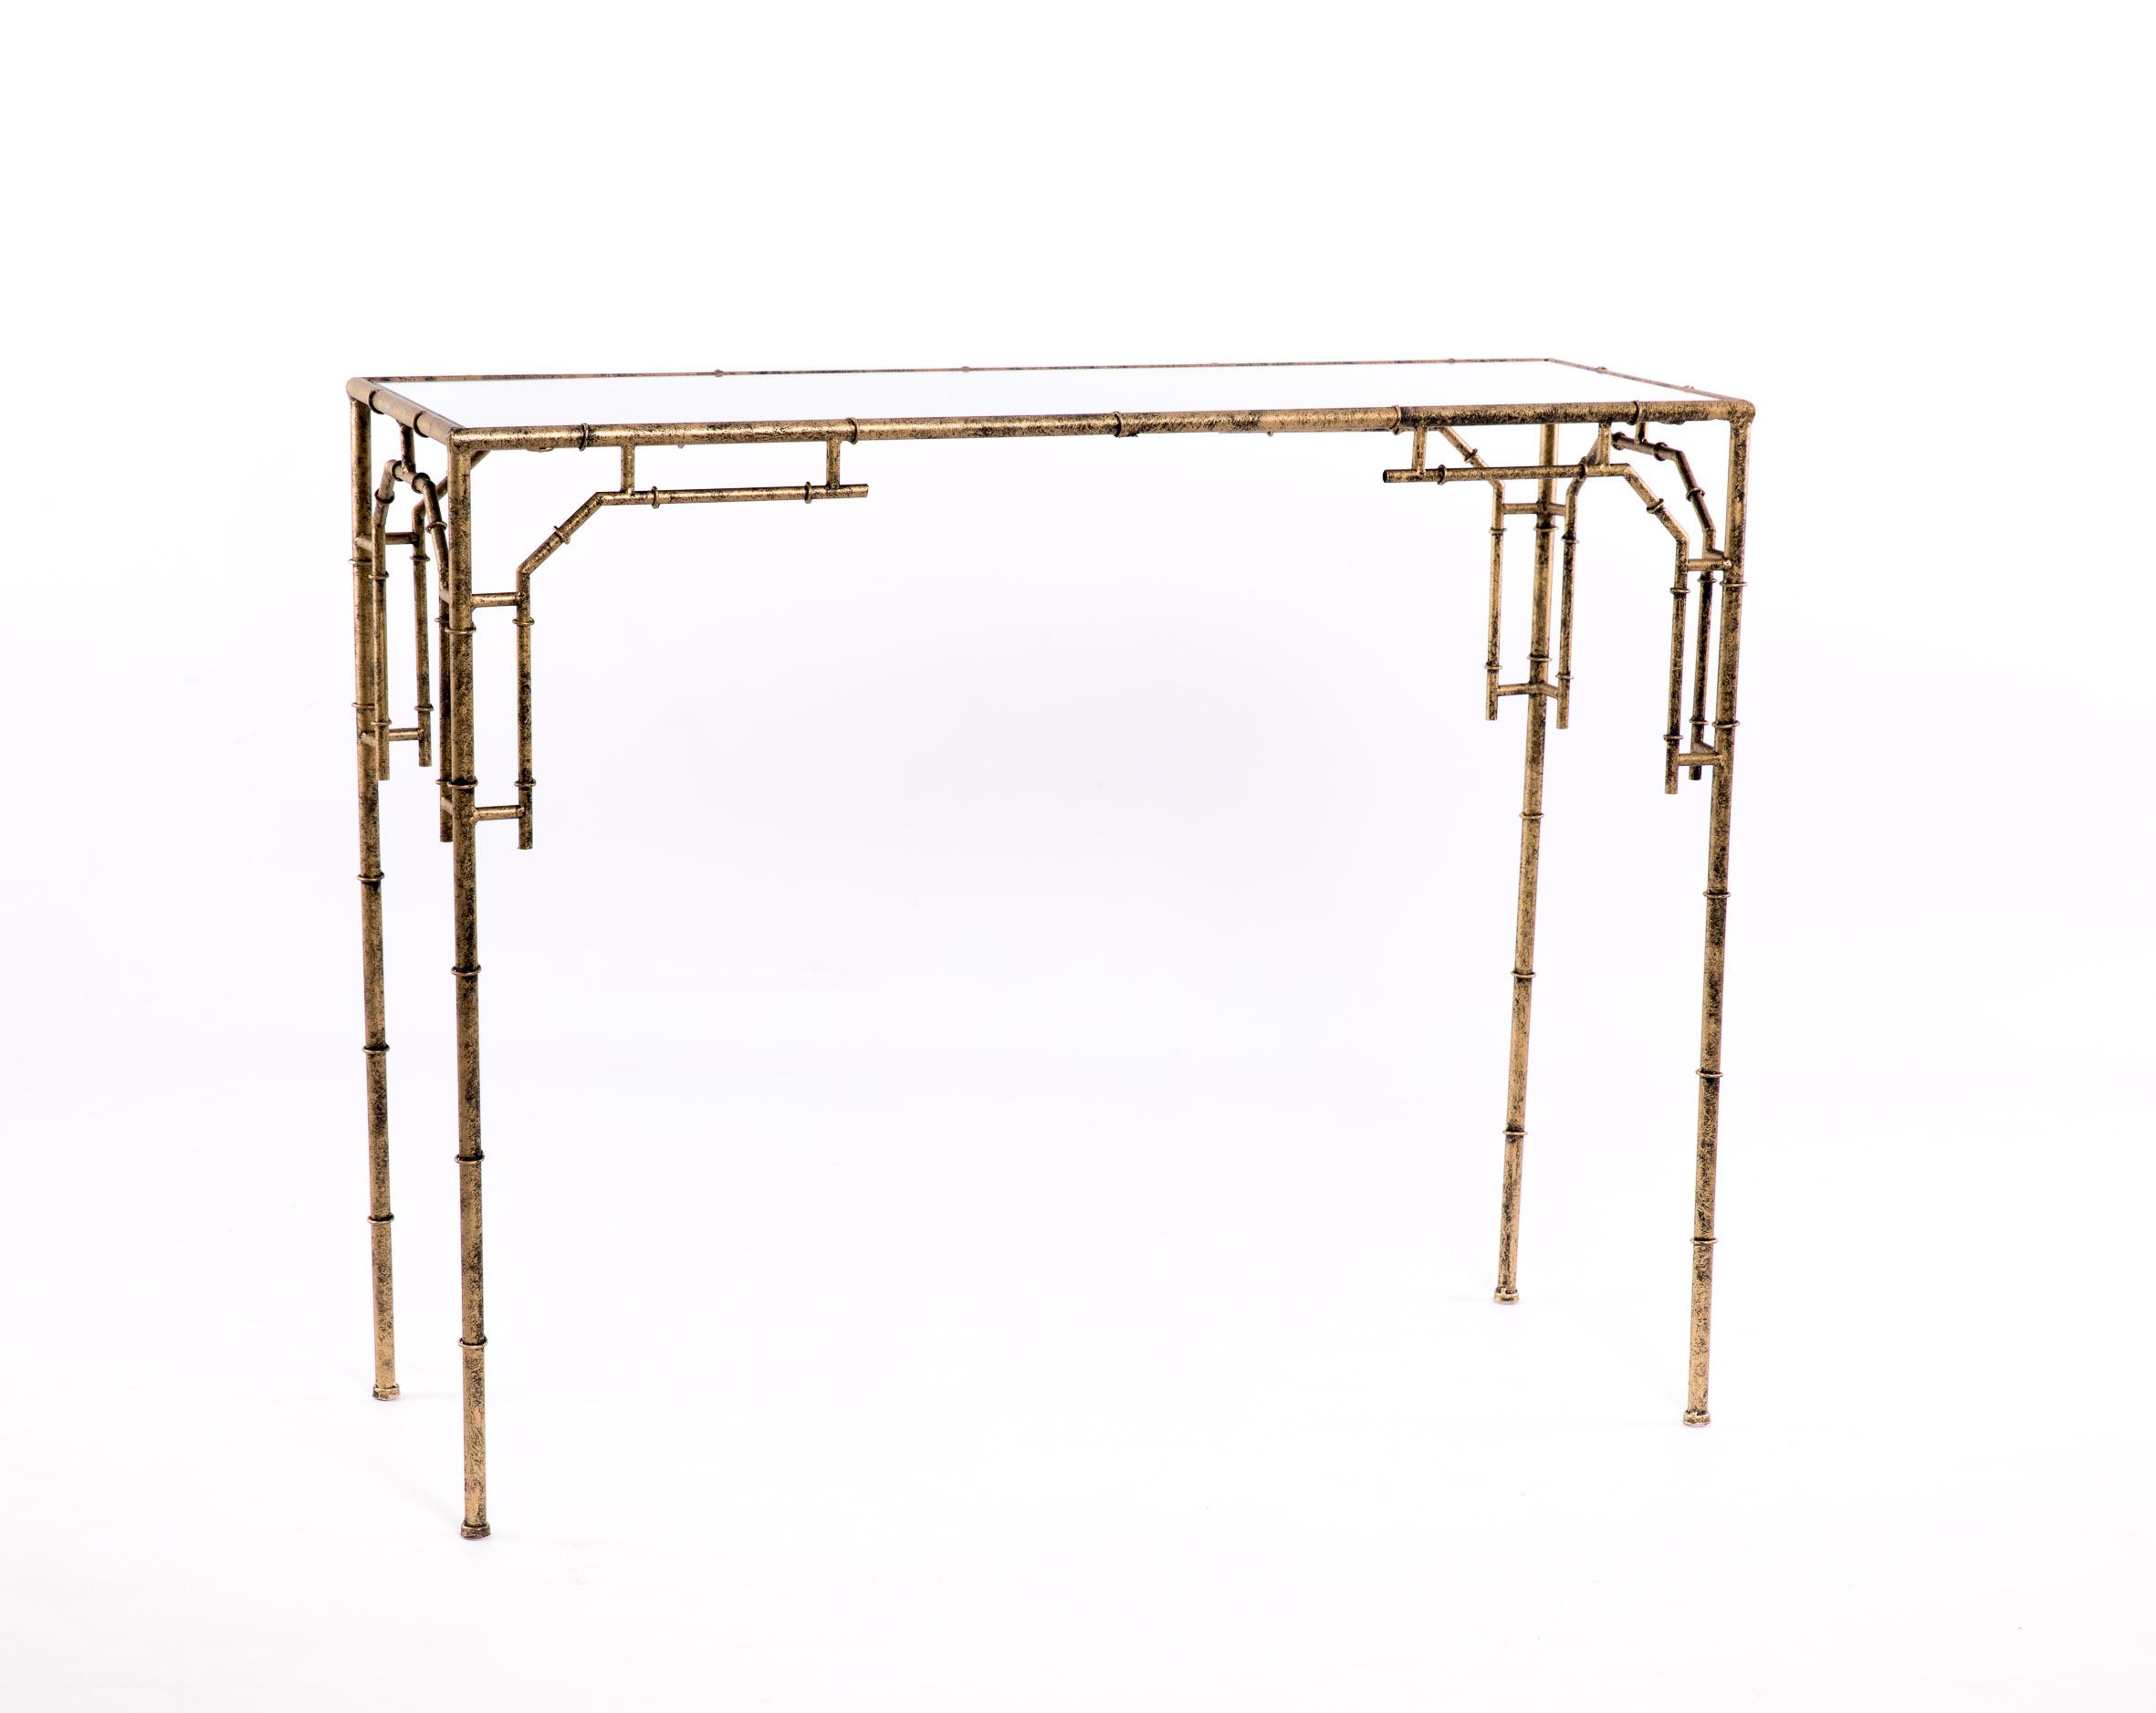 Comprar Consolas Madera Consola Mueble Cristal Kulunka Deco # Muebles Kulunka